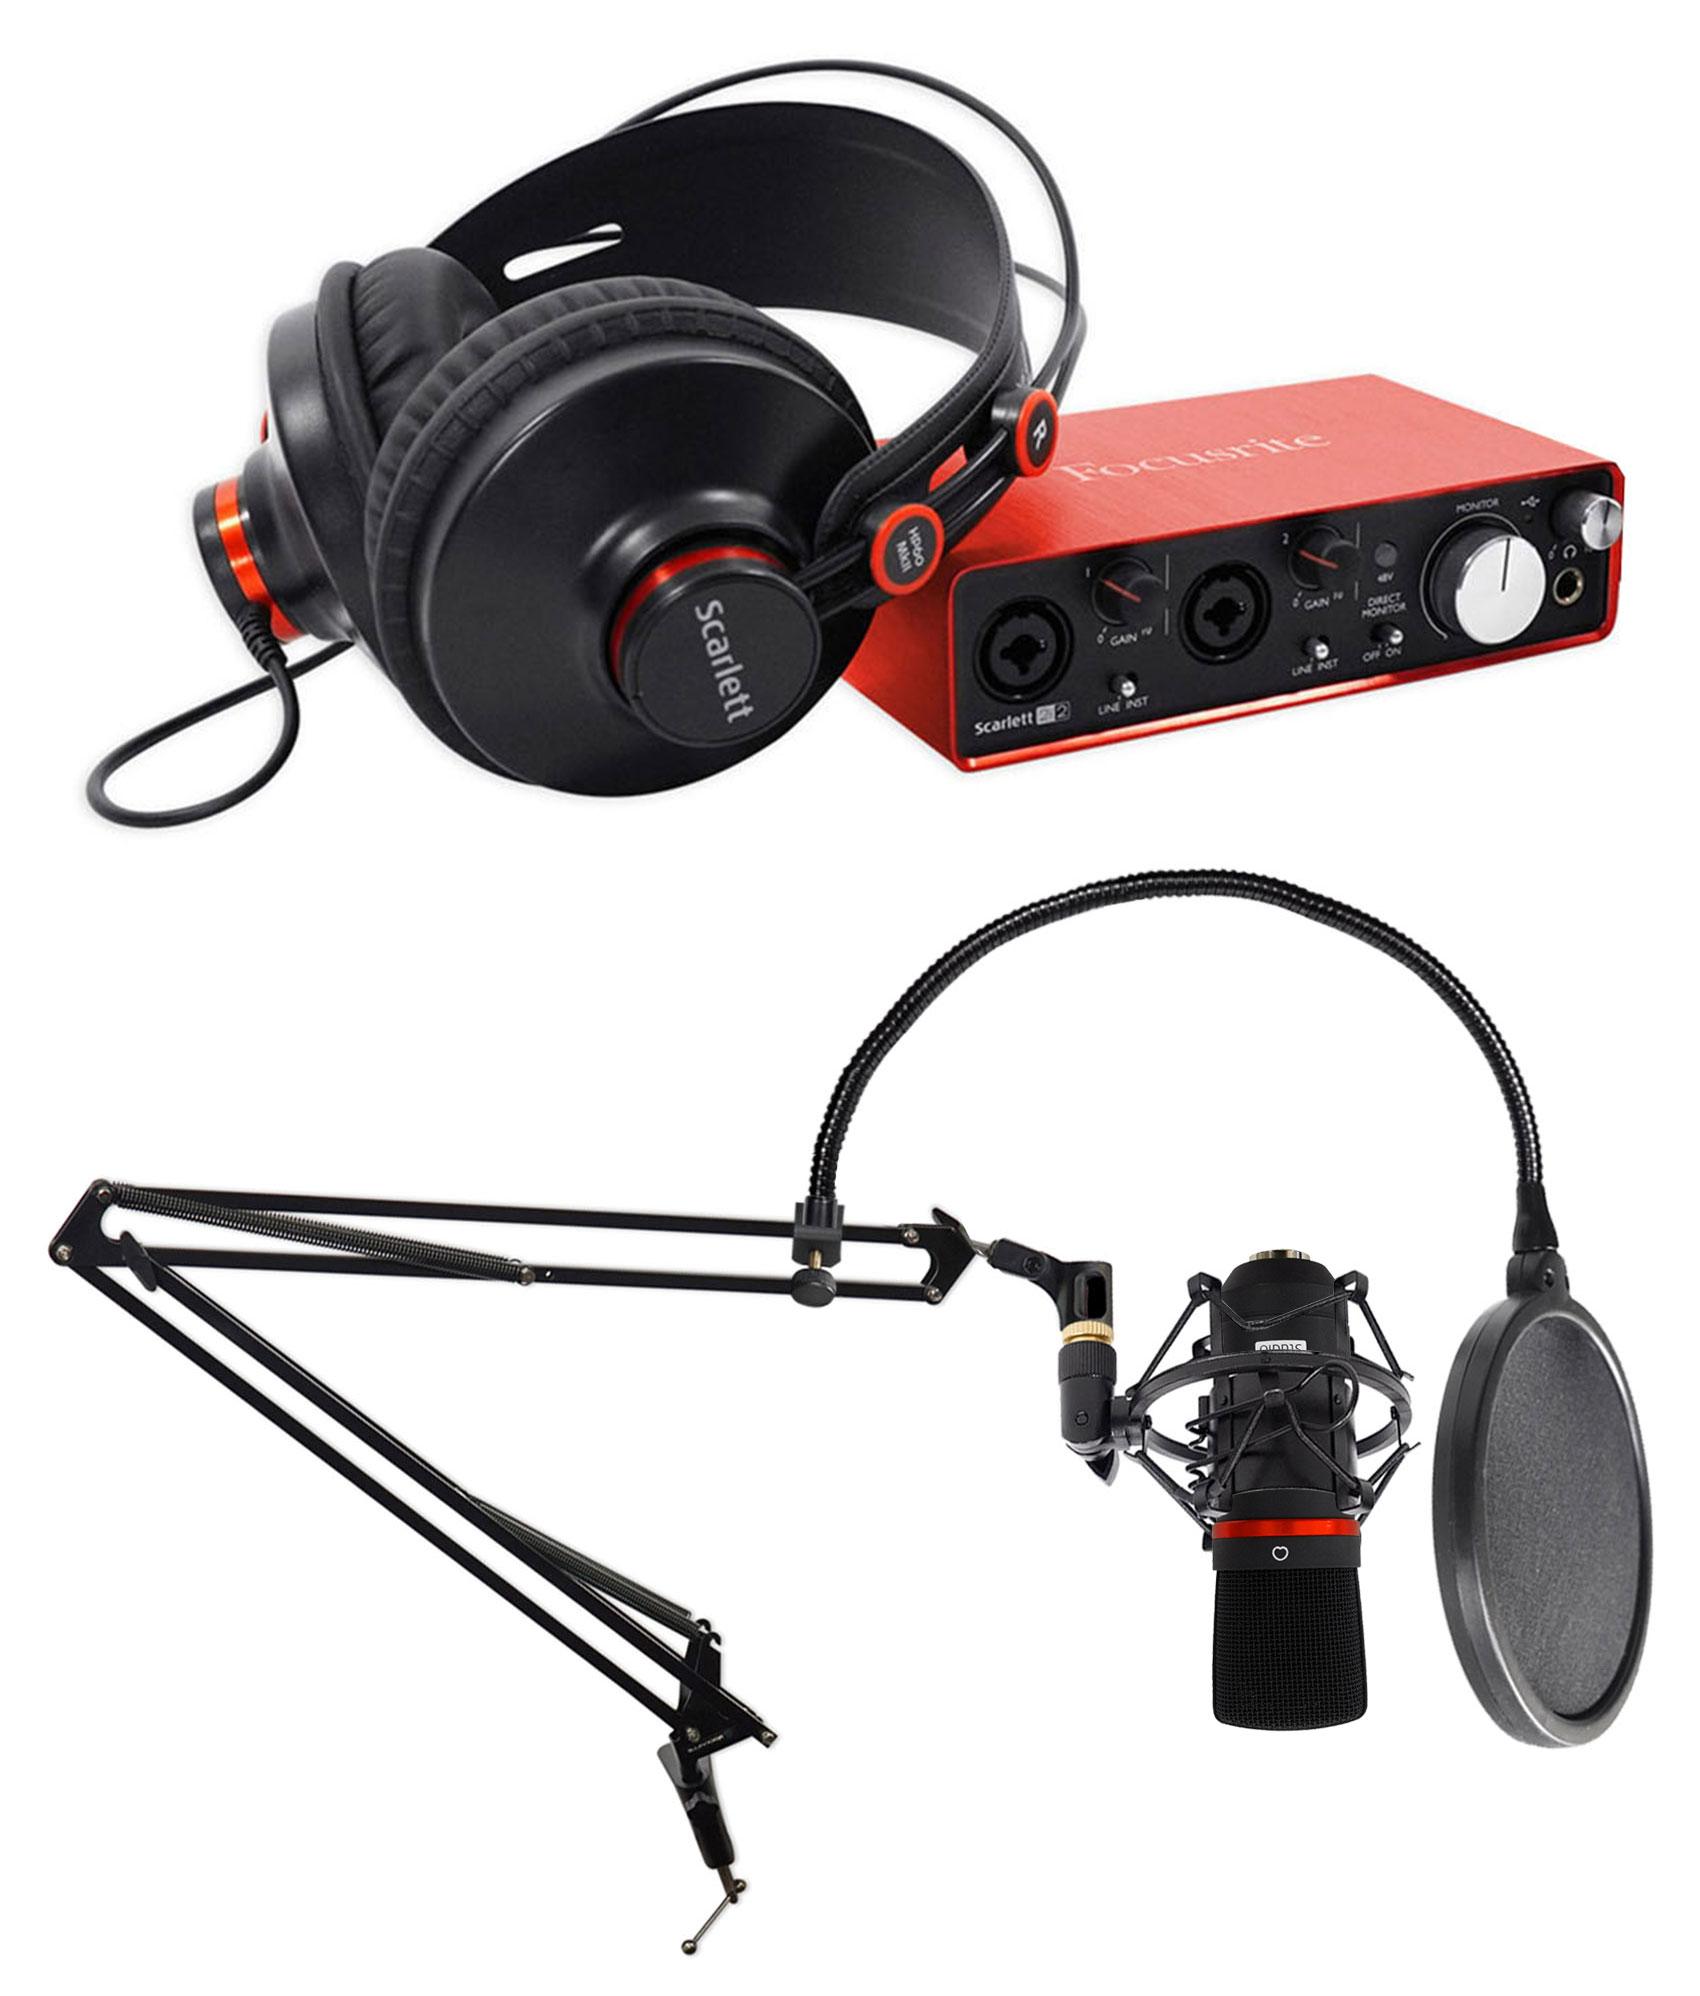 d7b37078000 Focusrite Scarlett 2i2 Gaming Streaming Twitch Kit w/Interface+Mic+ ...